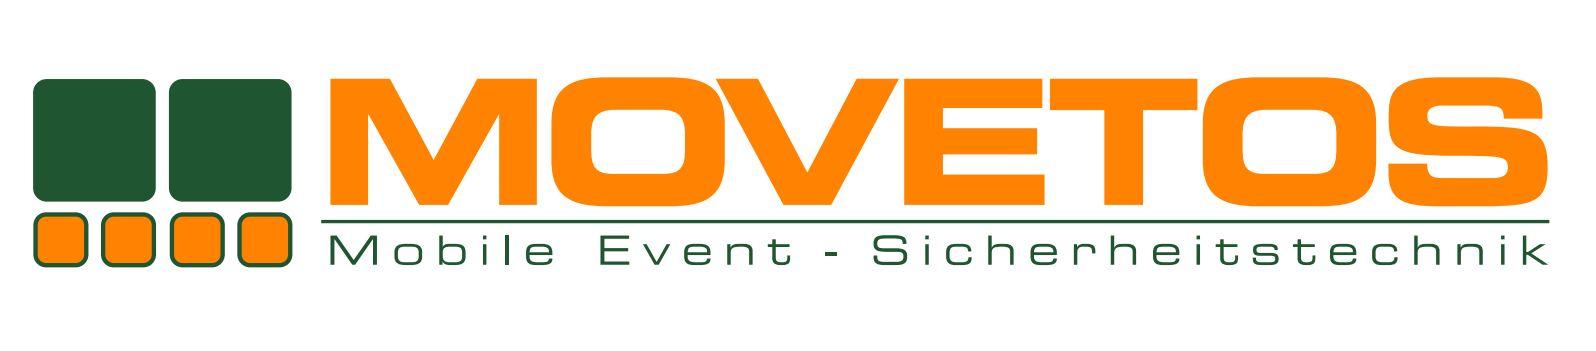 Logo der MOVETOS GmbH & Co.KG